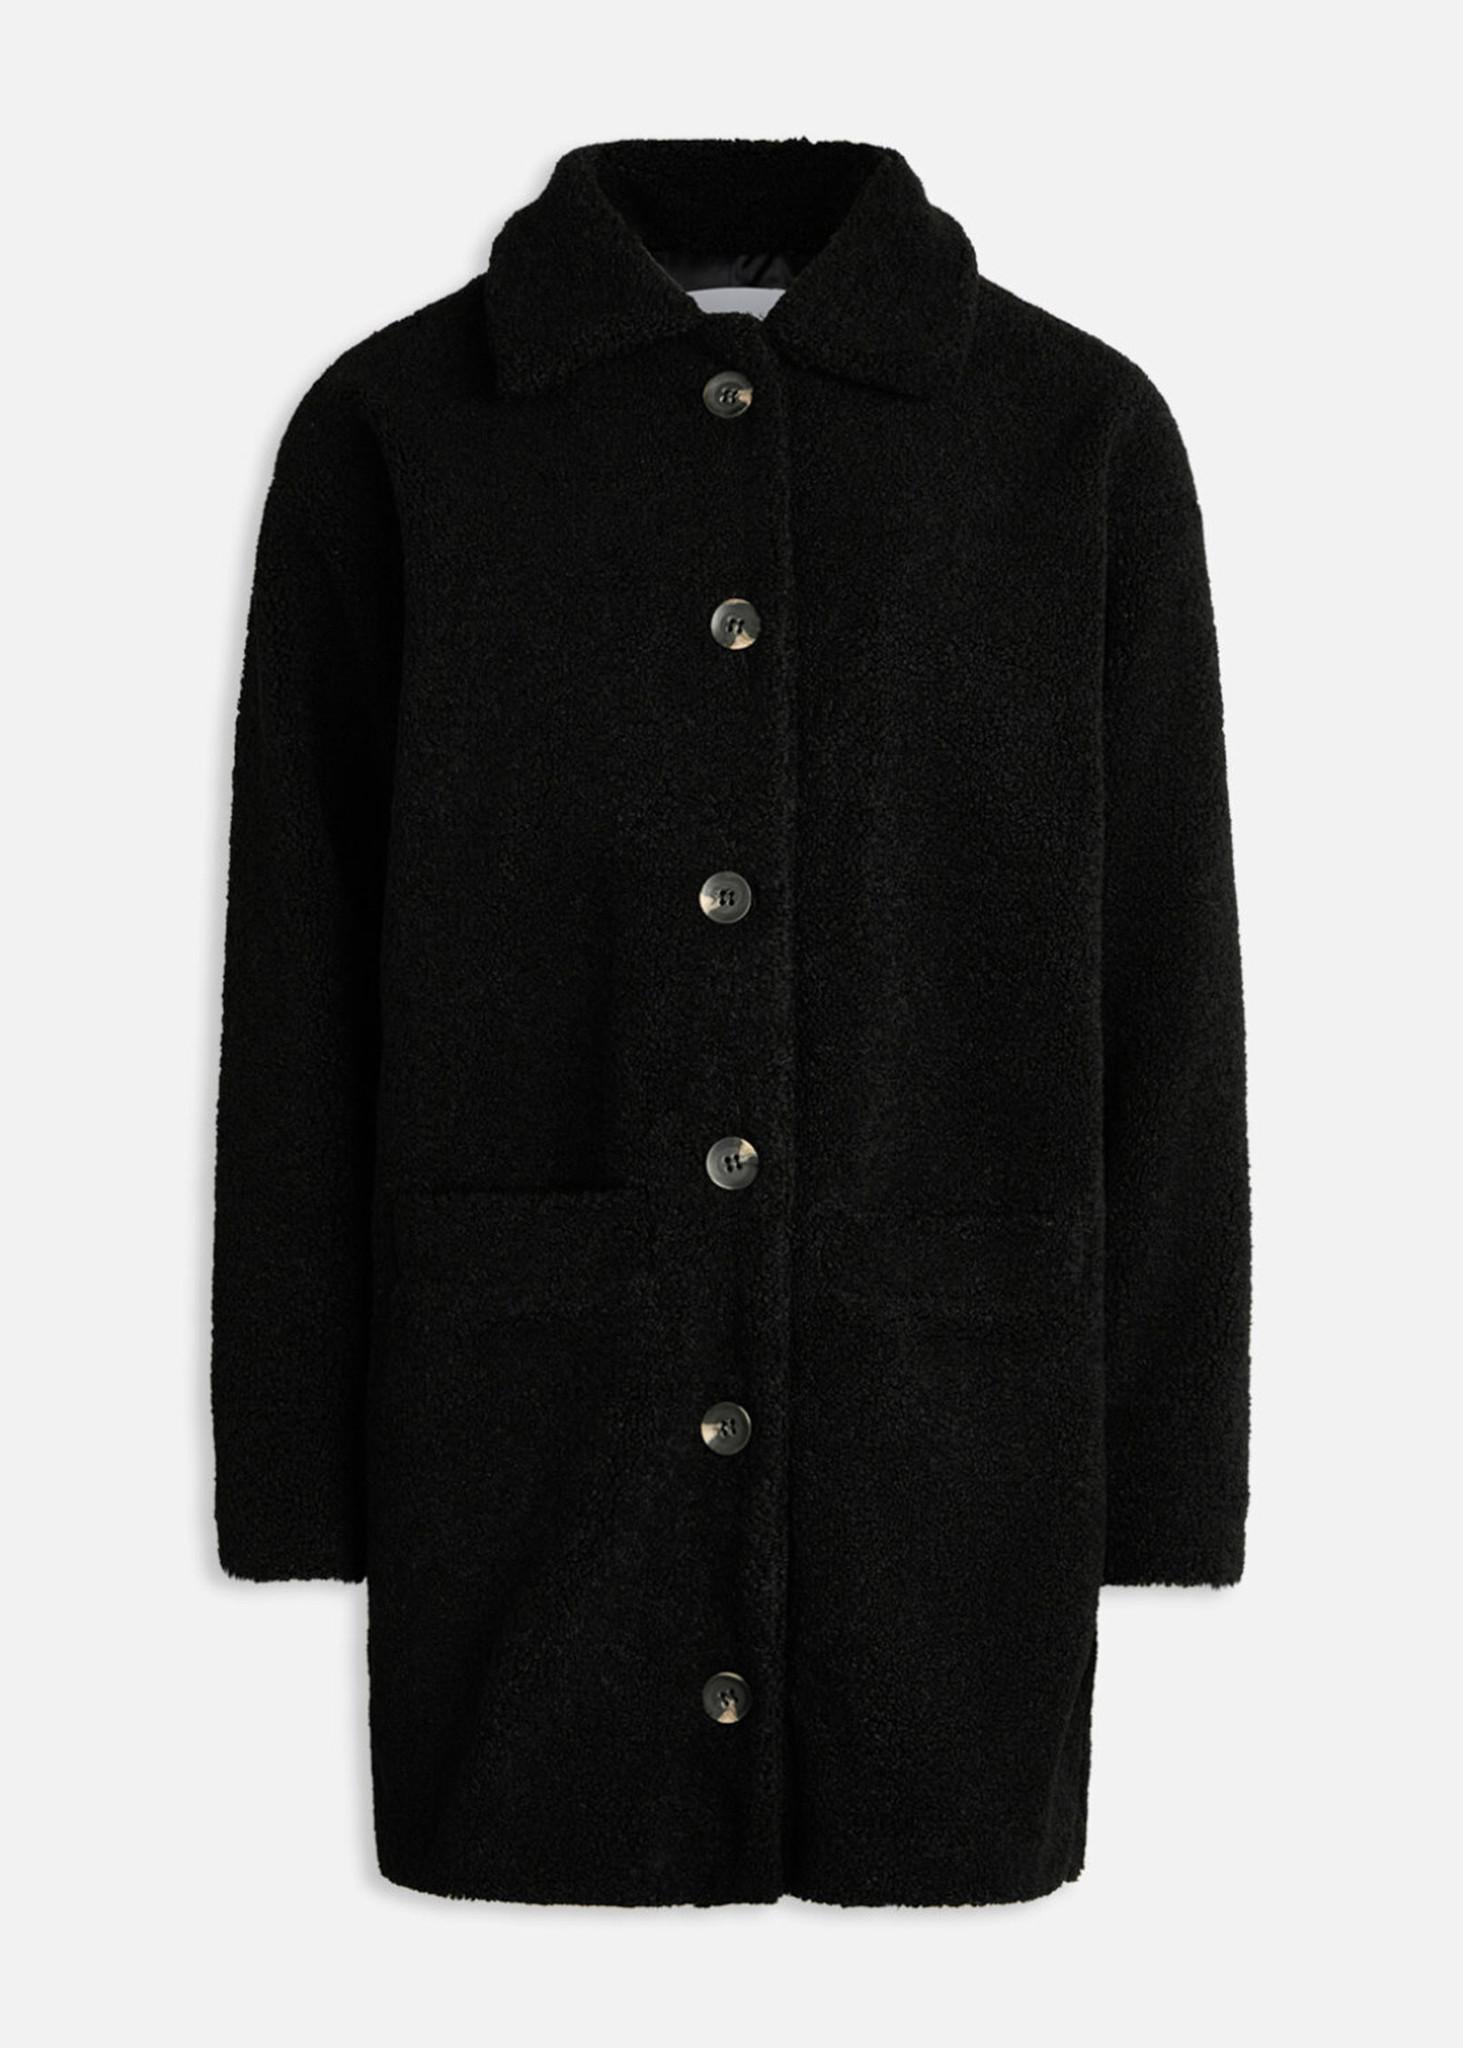 Dofi Jacket Black-1